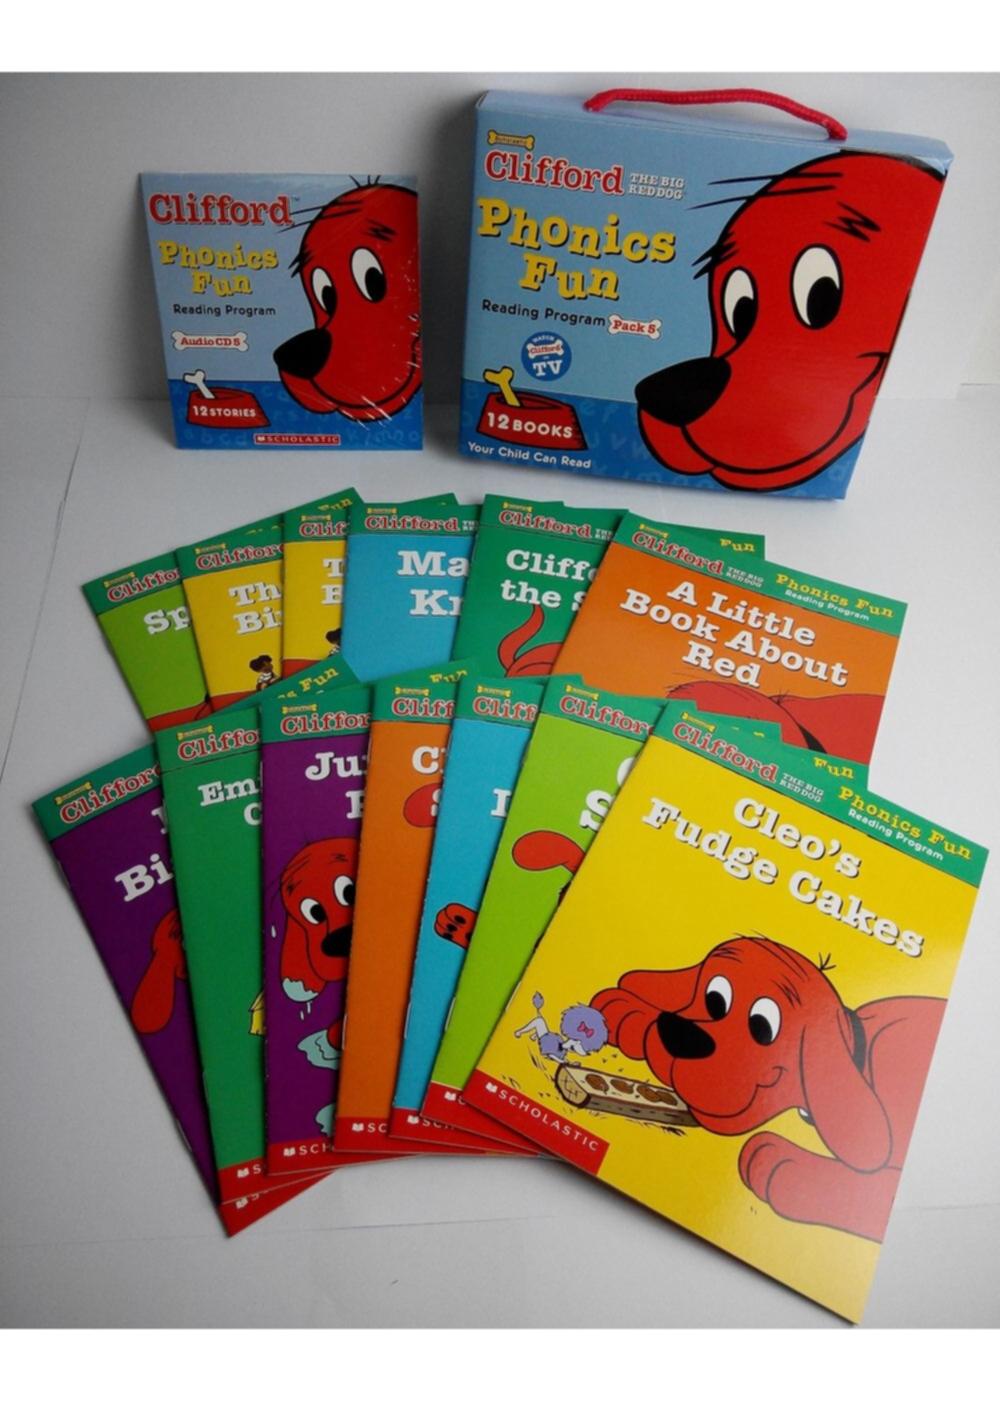 Clifford Phonics Fun: Reading Program Pack 5 (12 Books+CD)